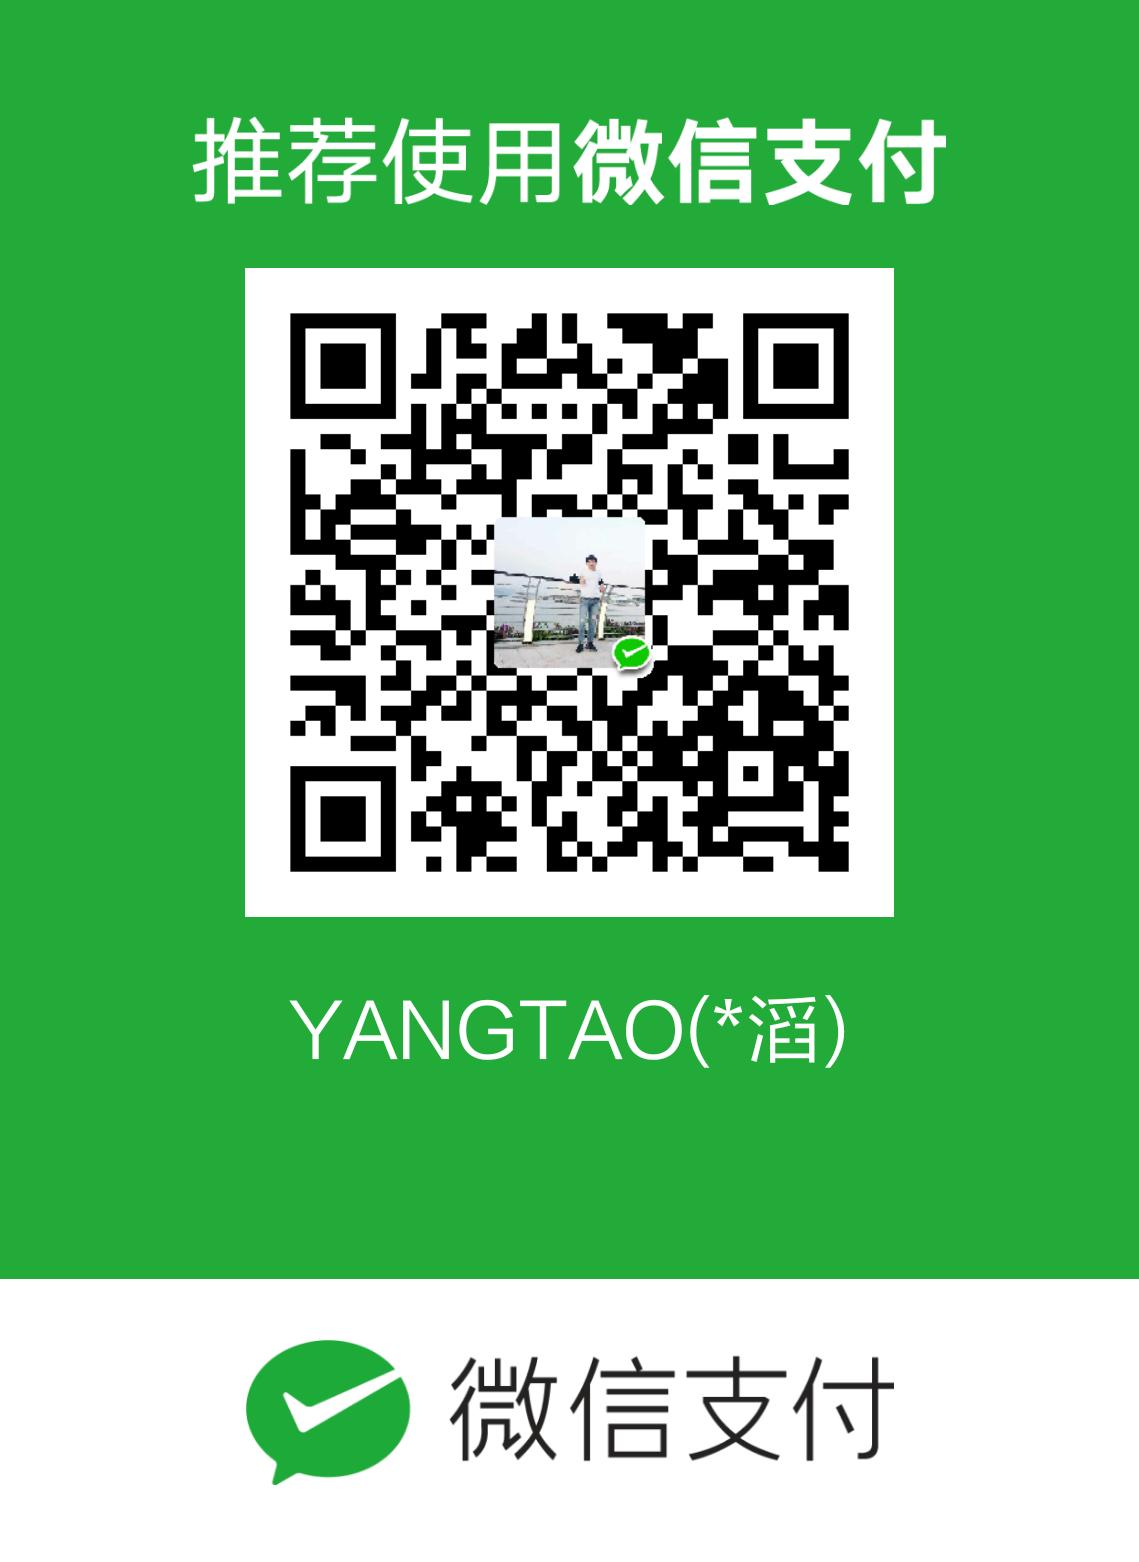 Yang Tao WeChat Pay